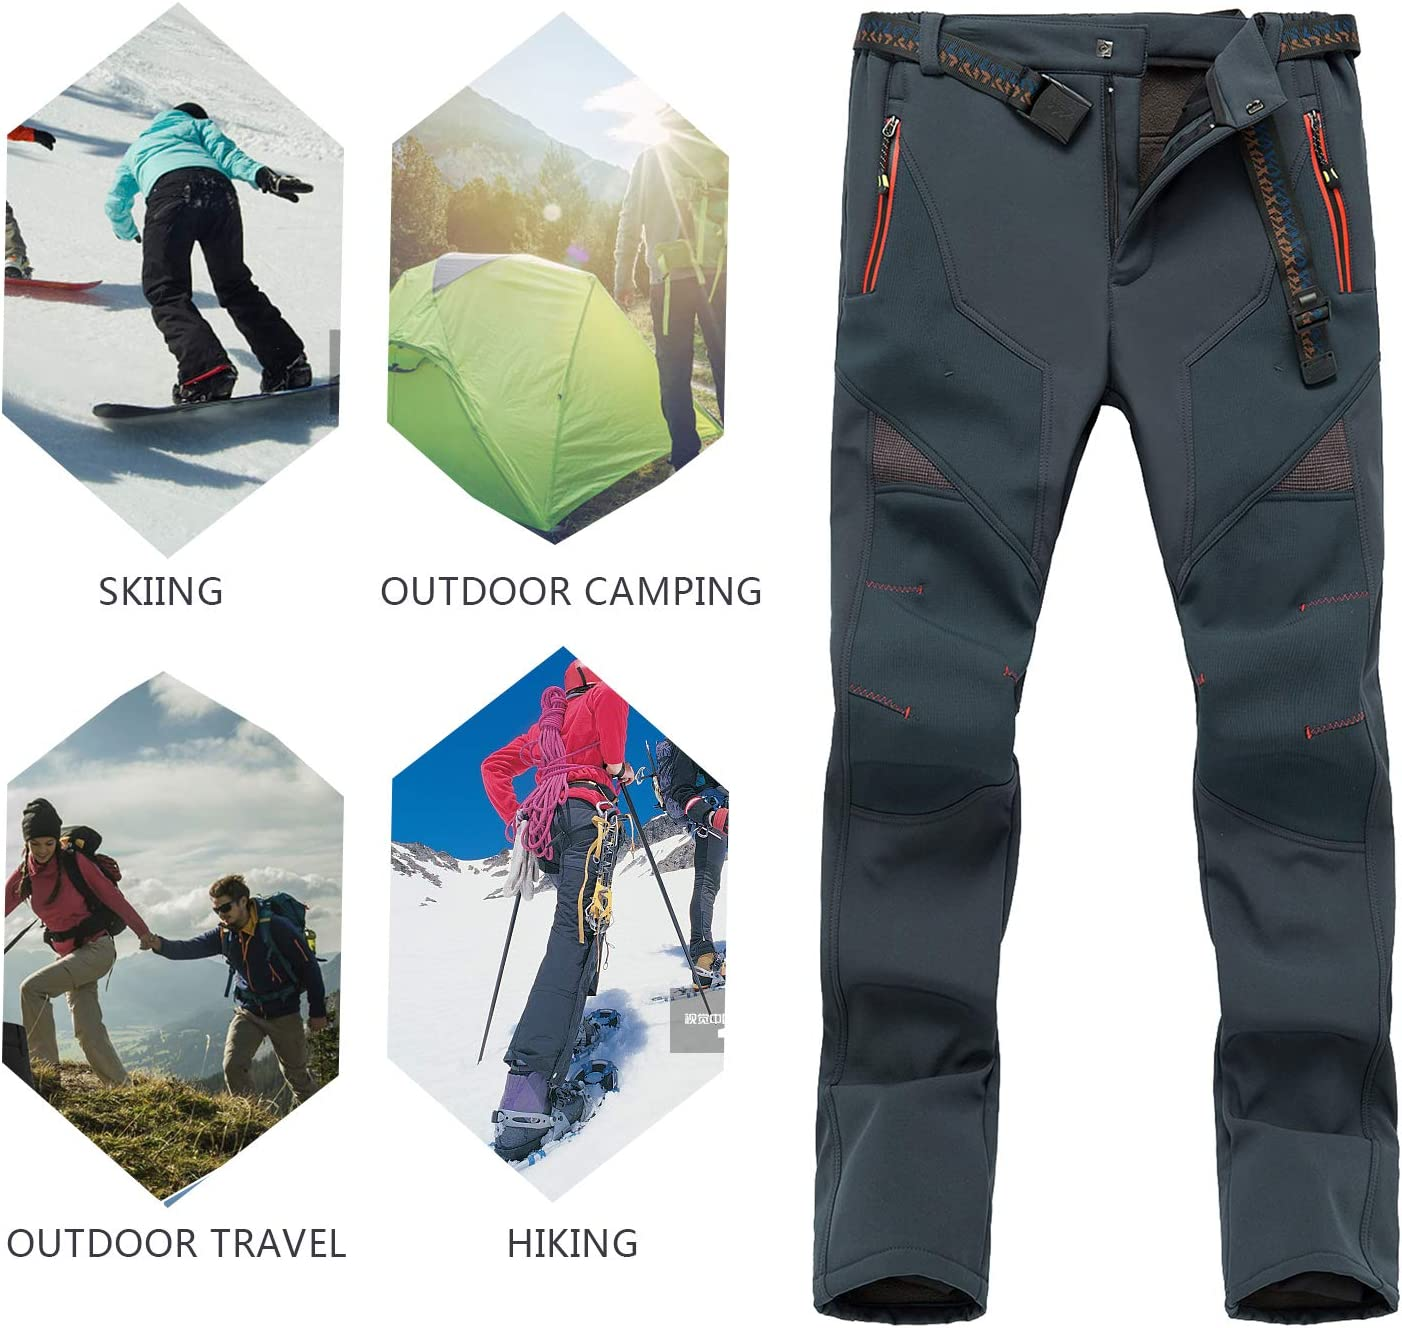 SUKUTU Womens Softshell Fleece Lined Hiking Trousers Outdoor Lightweight Quick Dry Walking Climbing Pants